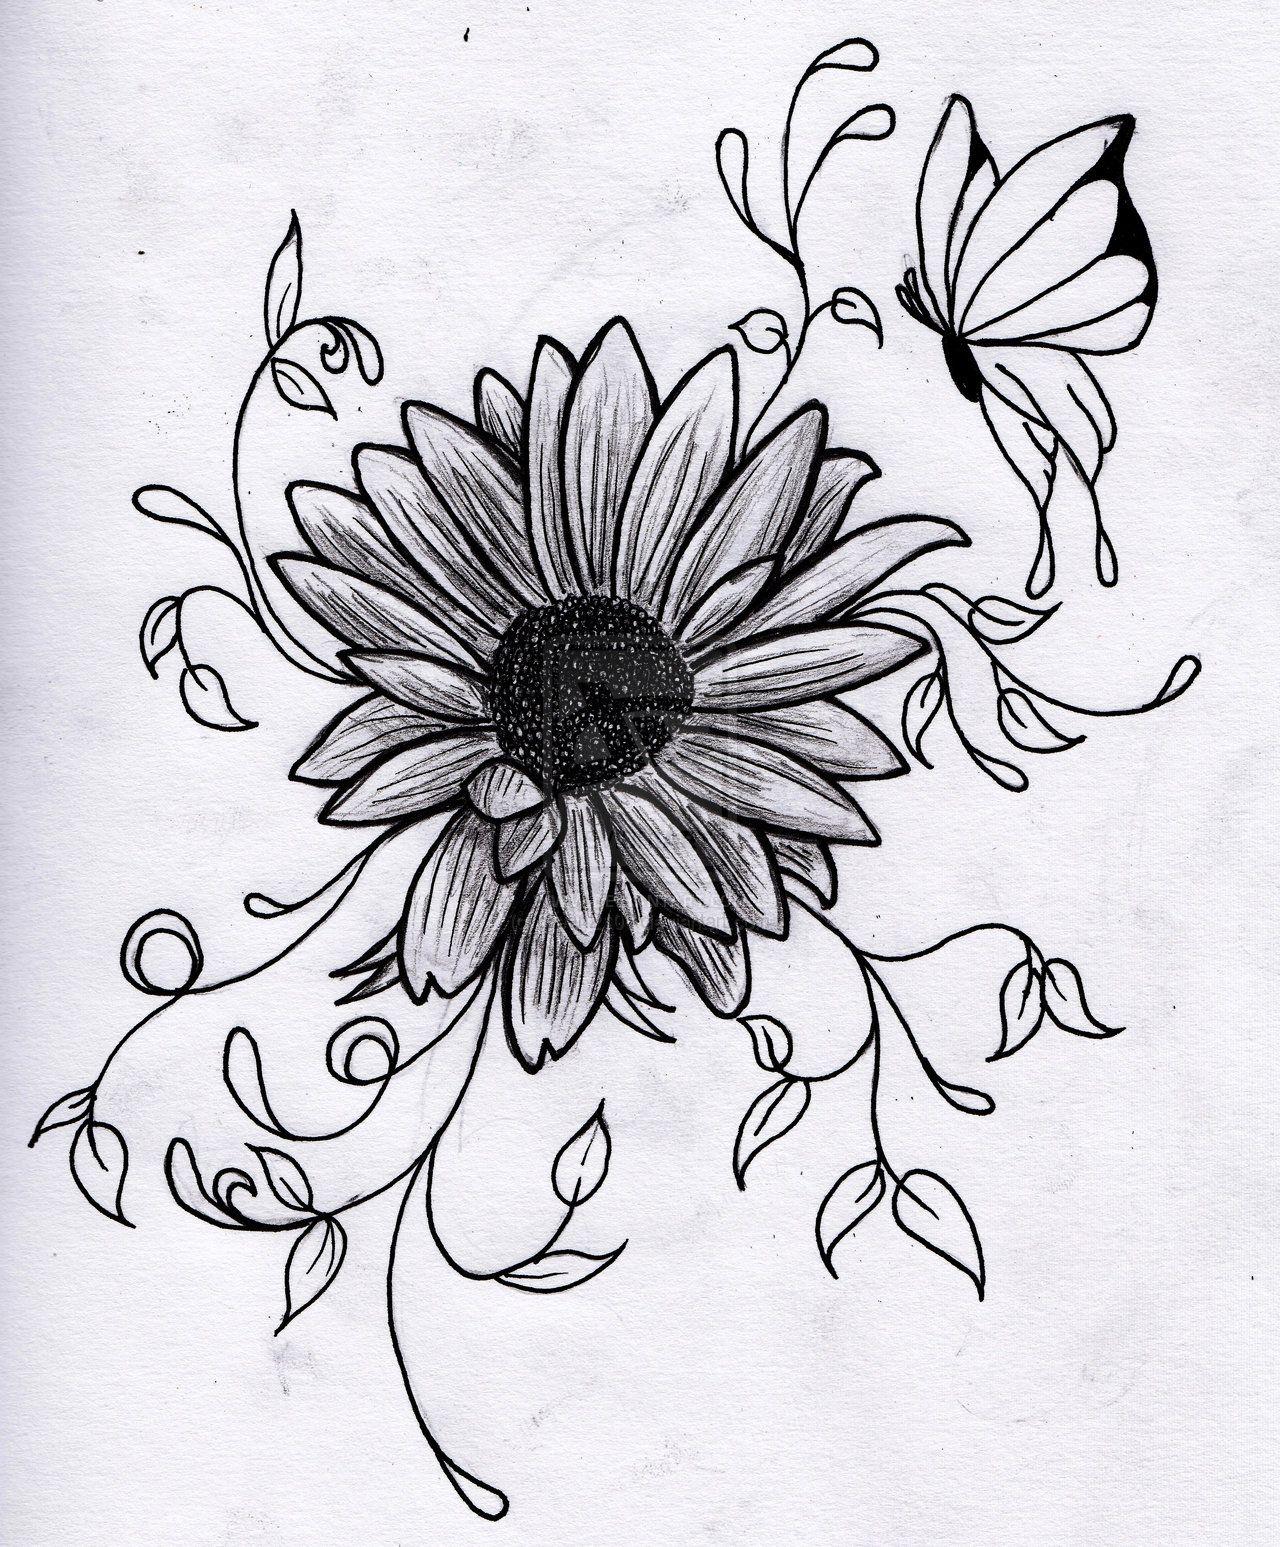 flower drawings - Google Search | Tattoo ideas | Pinterest ...